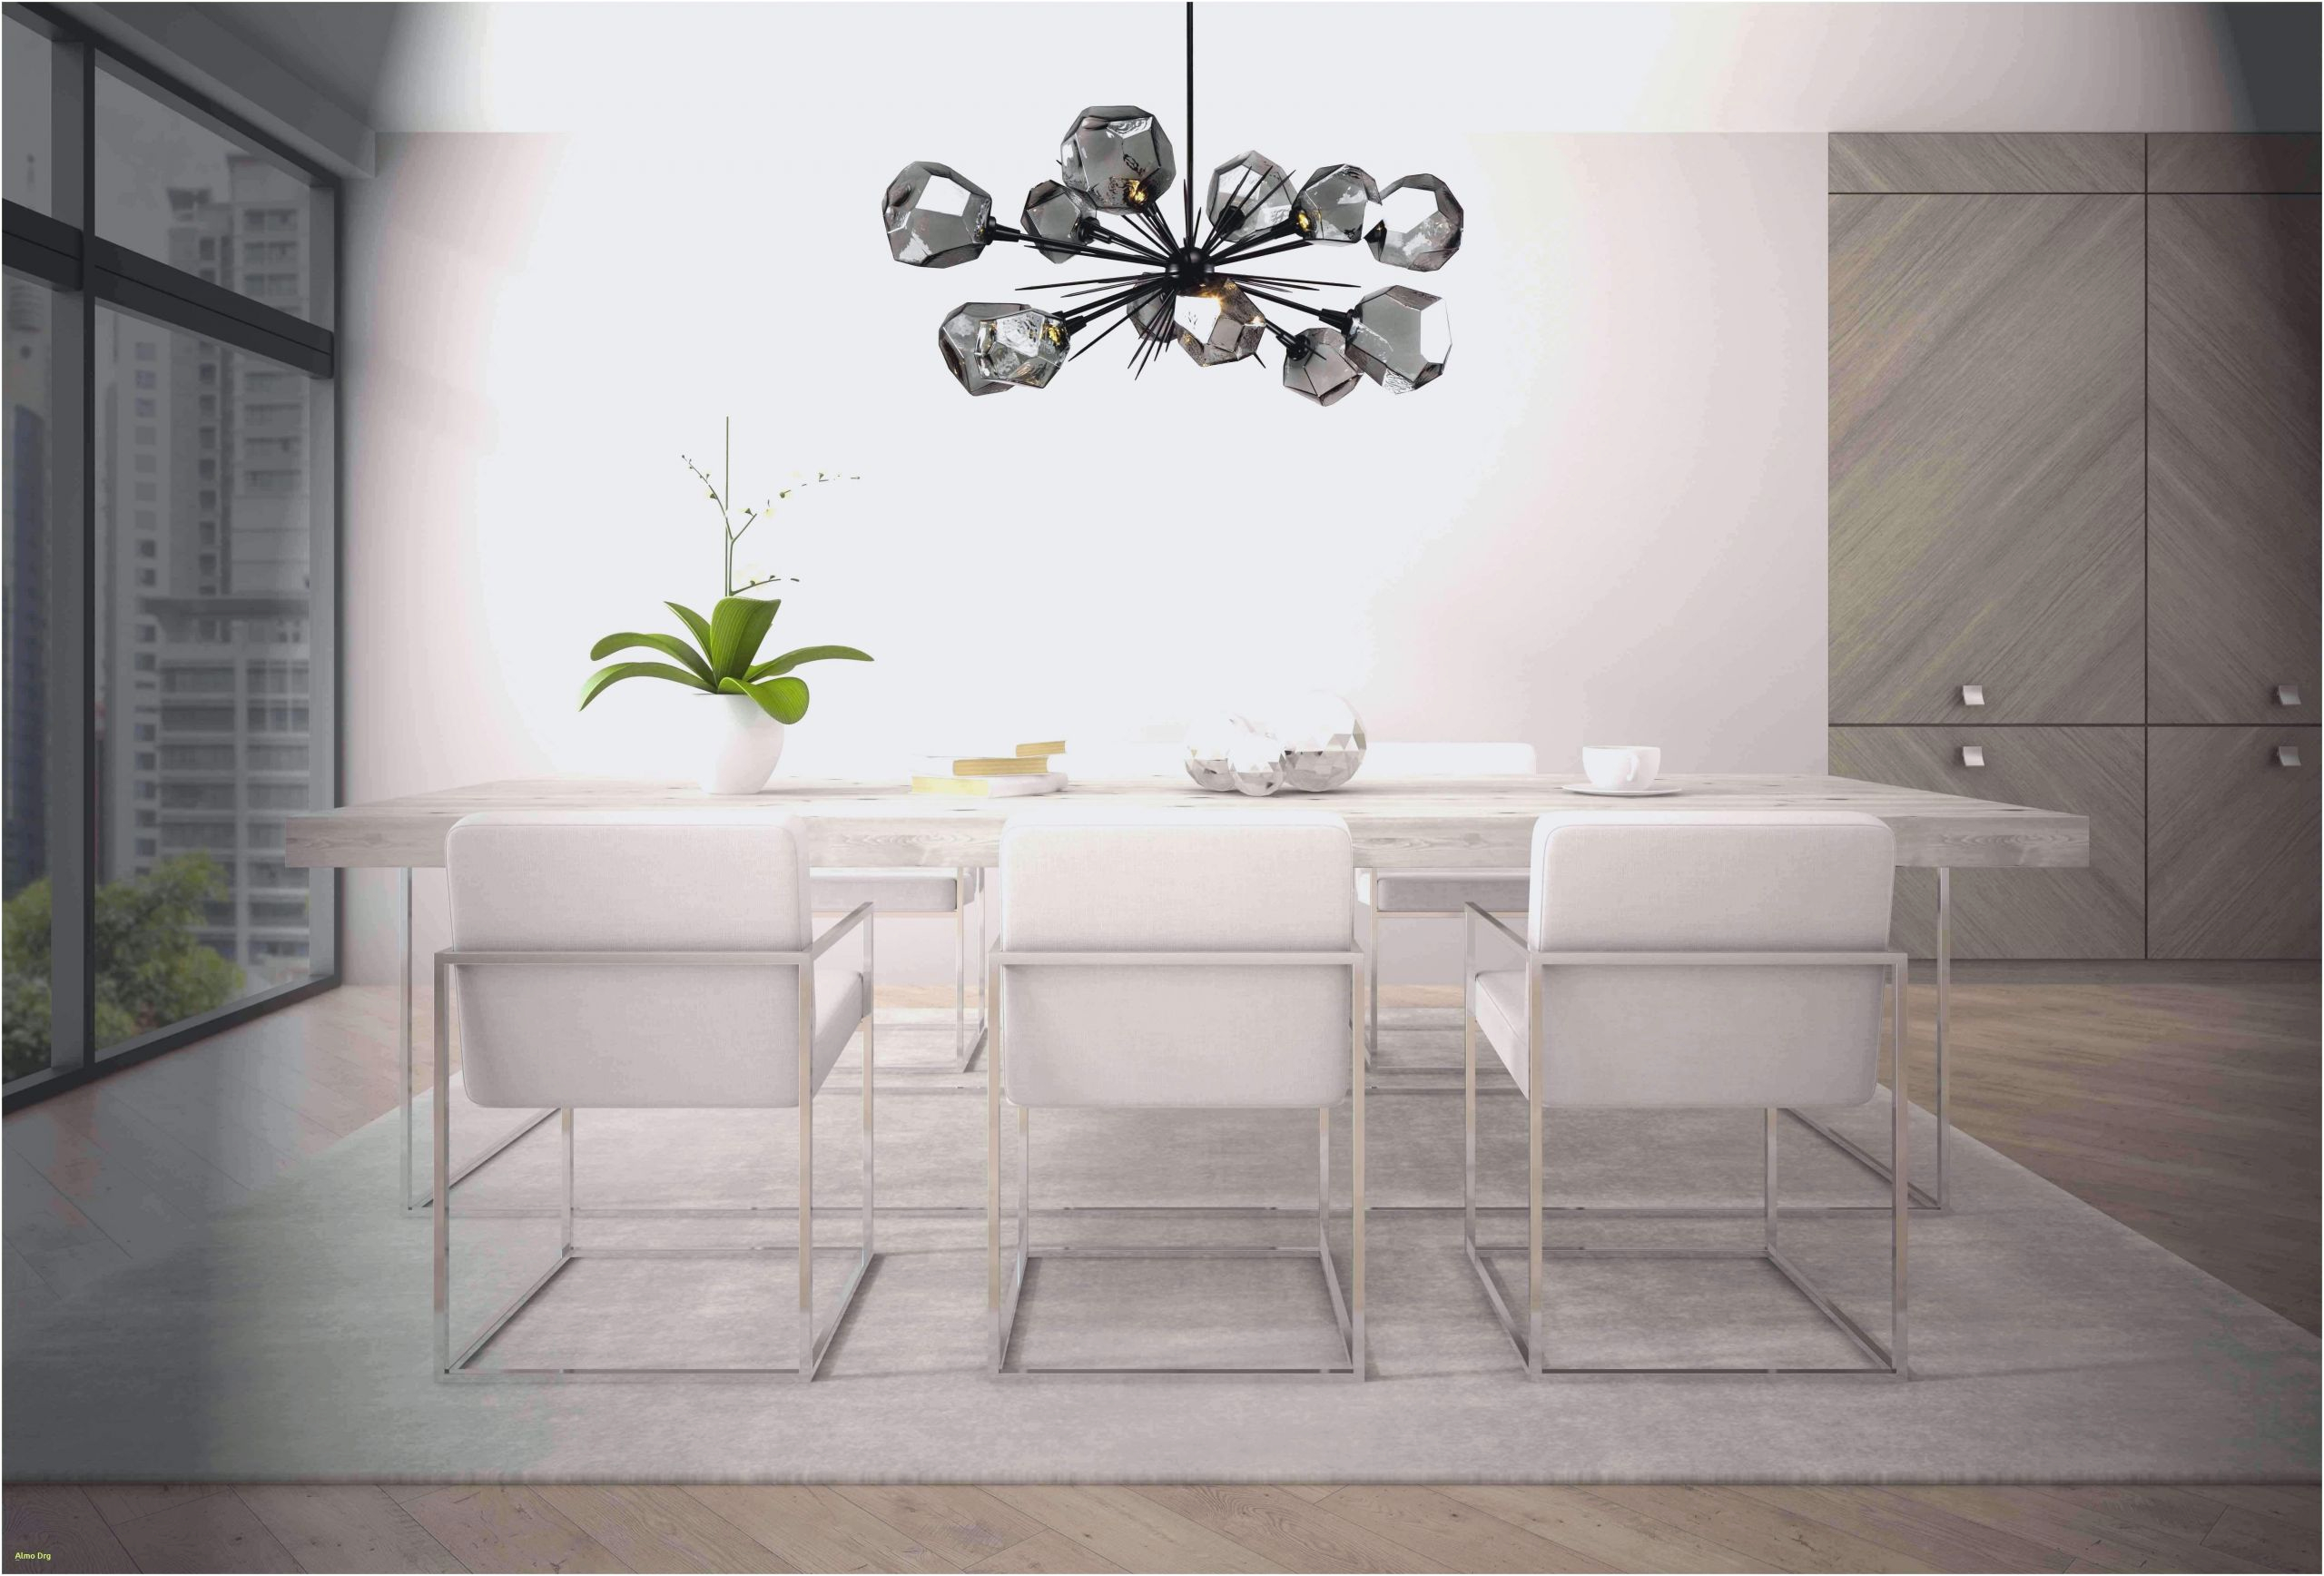 Led Badezimmer Lampe Wohnzimmer Design Ideen Luxus Luxe Led Lampe Badezimmer